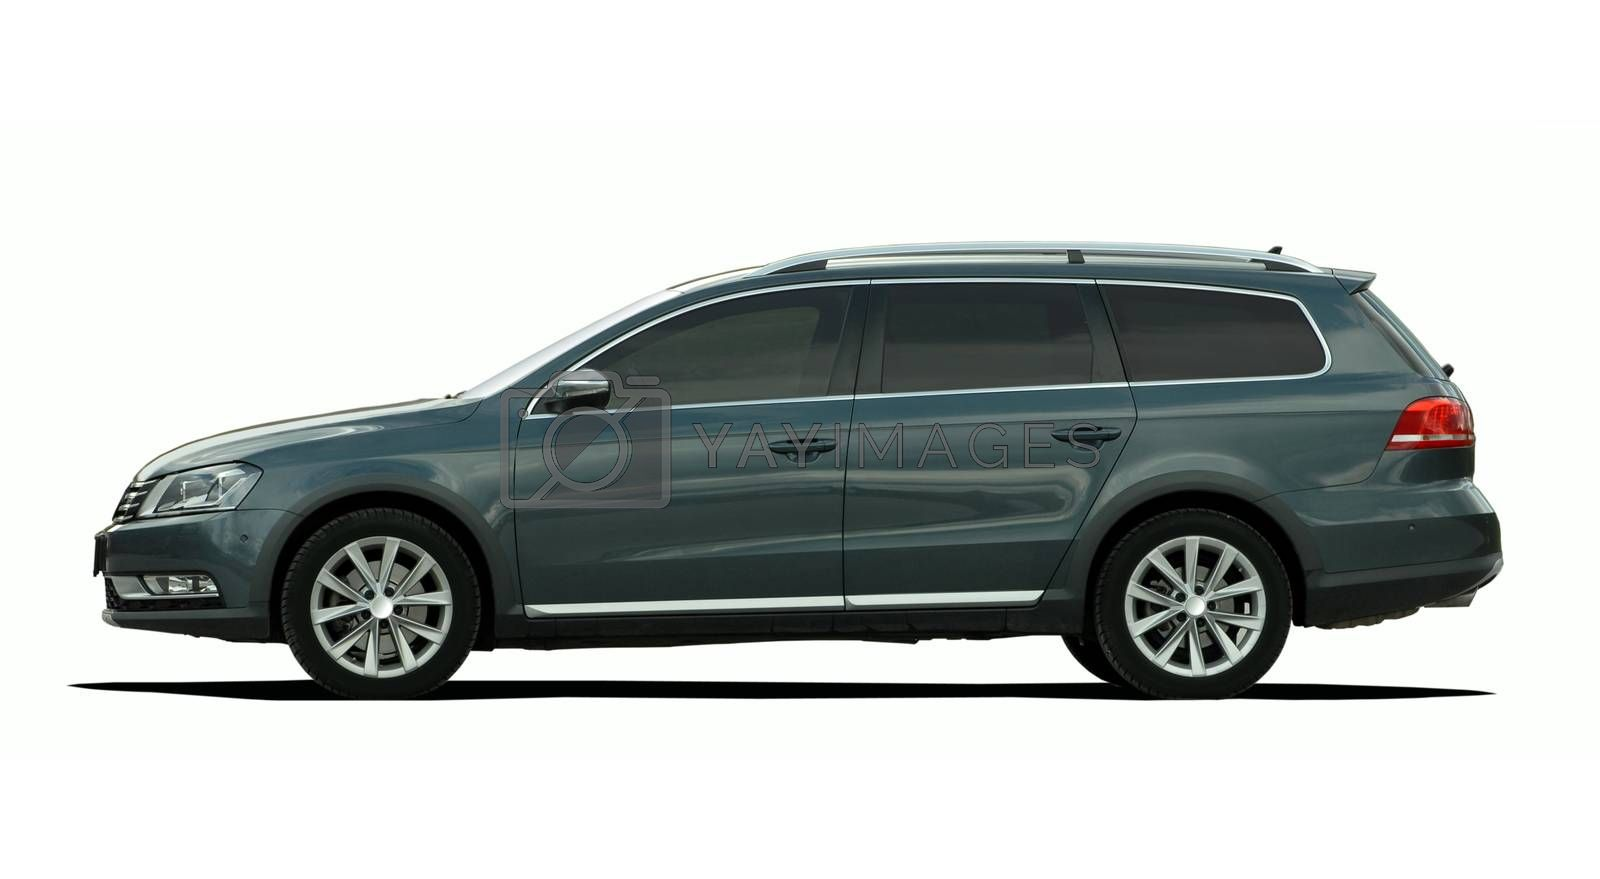 large gray station wagon isolated on white backgroun